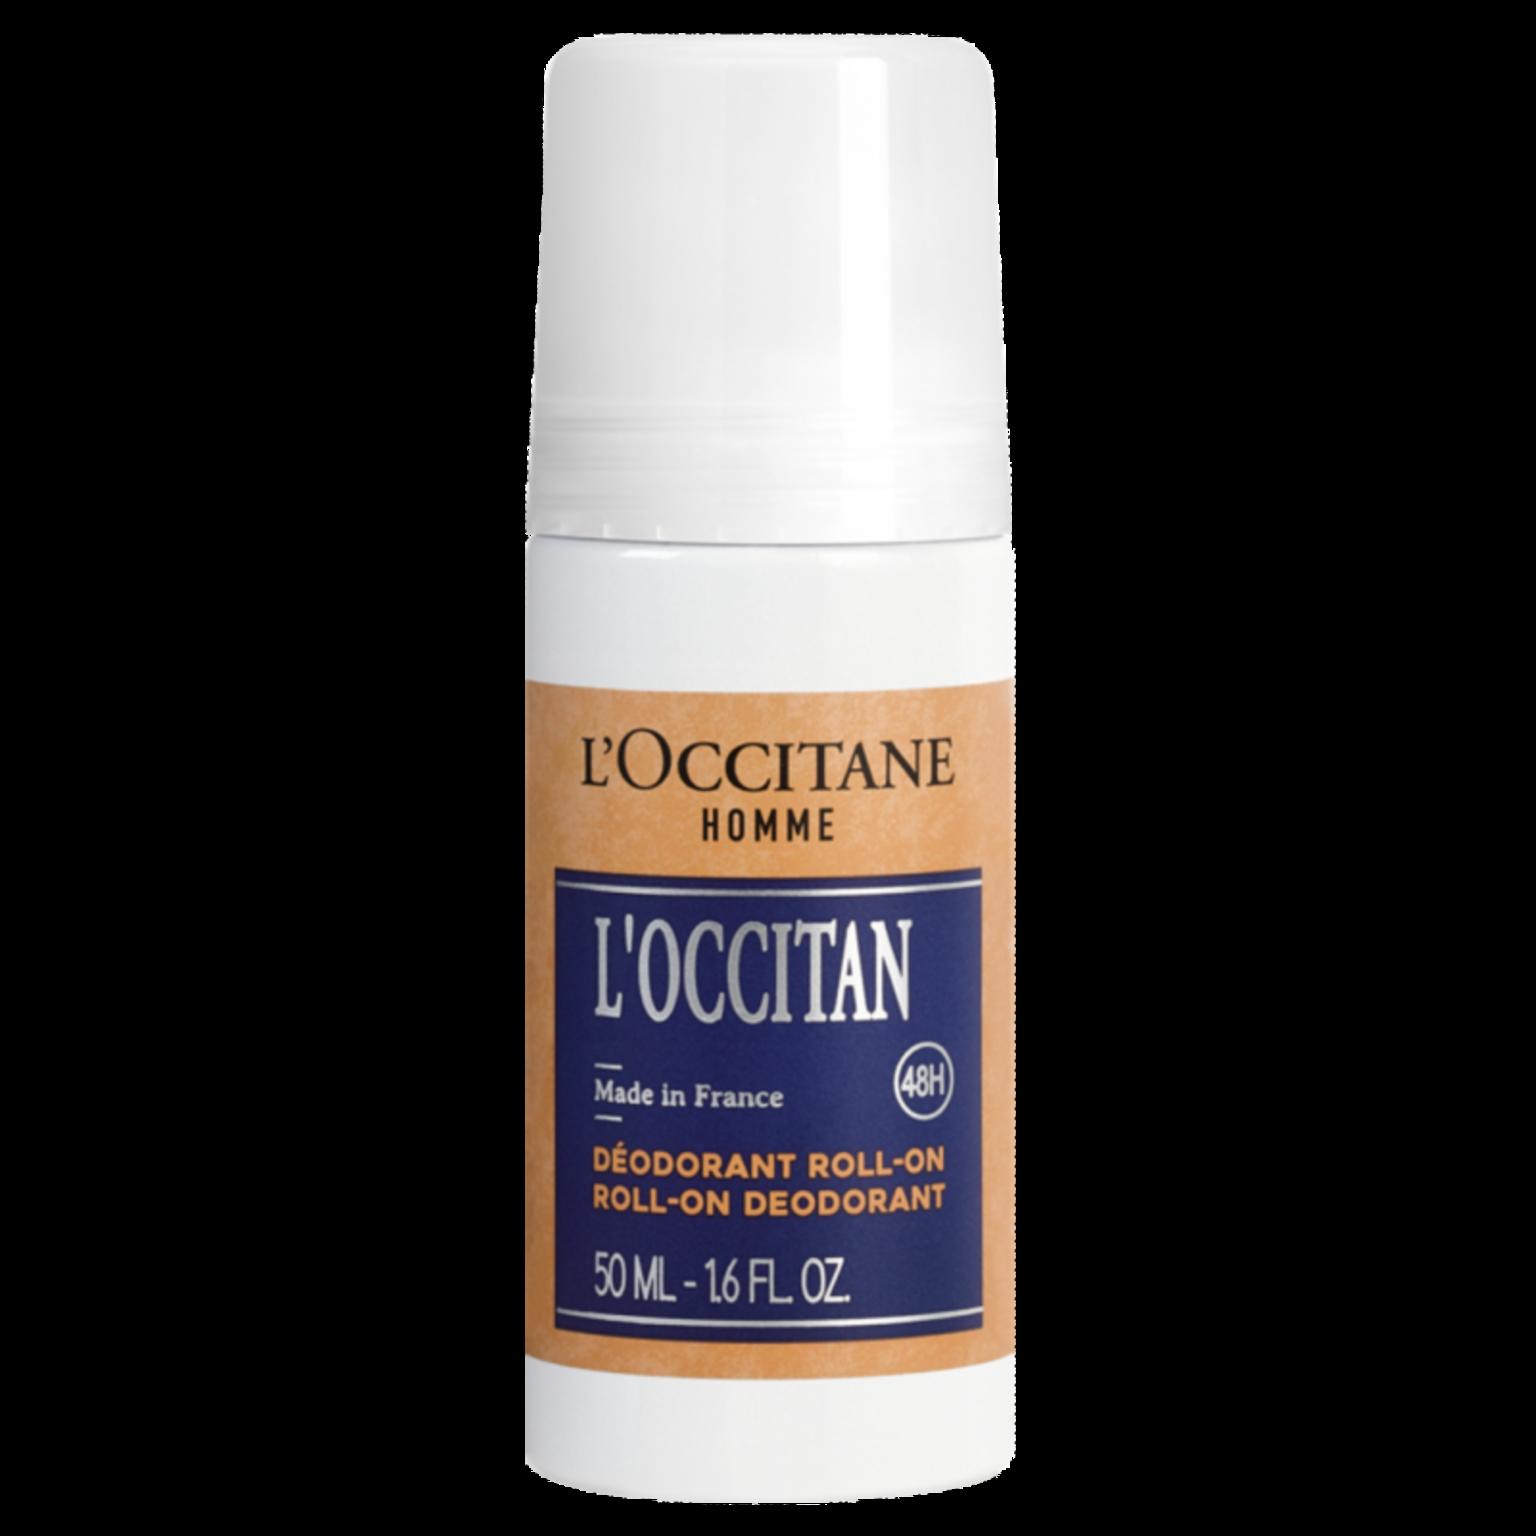 L'Occitane Men L'Occitane Deodorant Roll-On 50ml